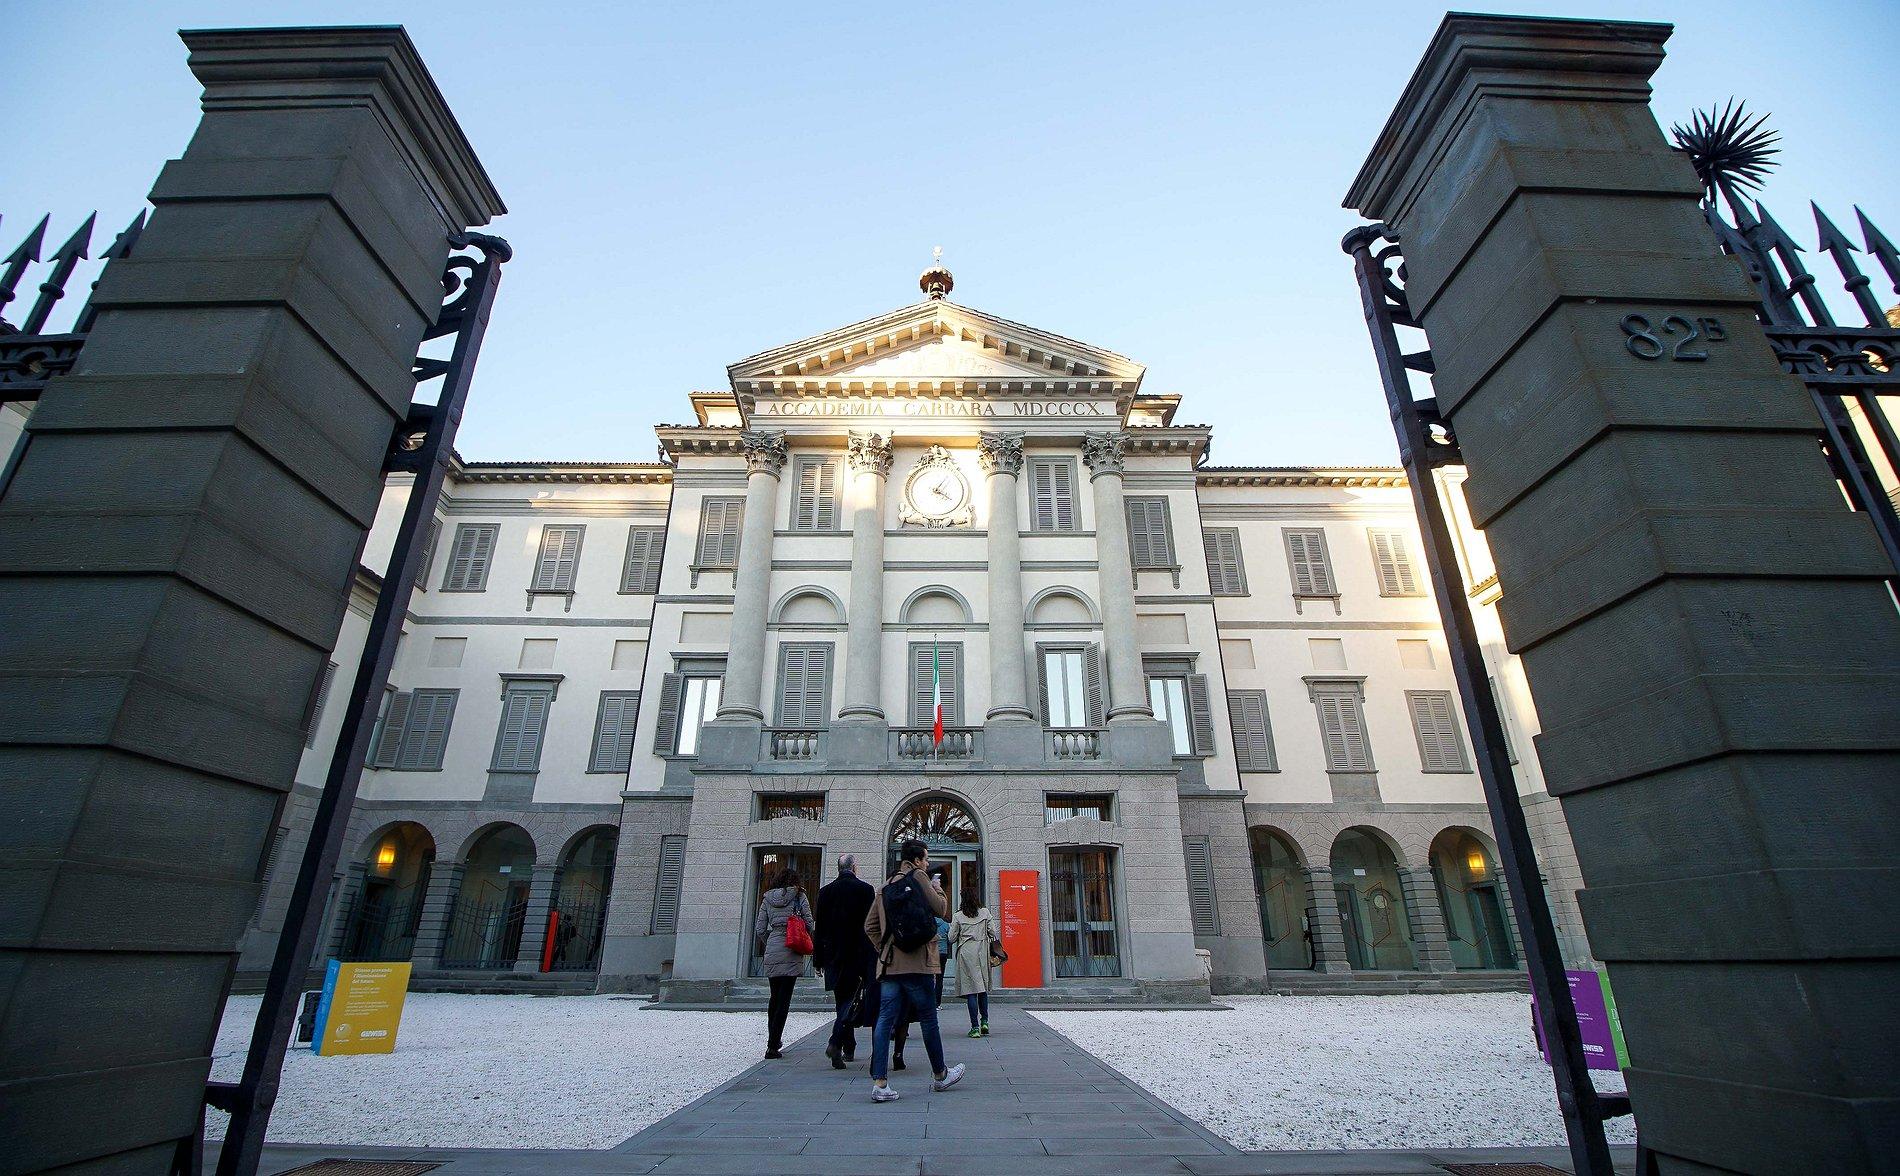 RE-M Mantegna, mostra-evento alla Carrara